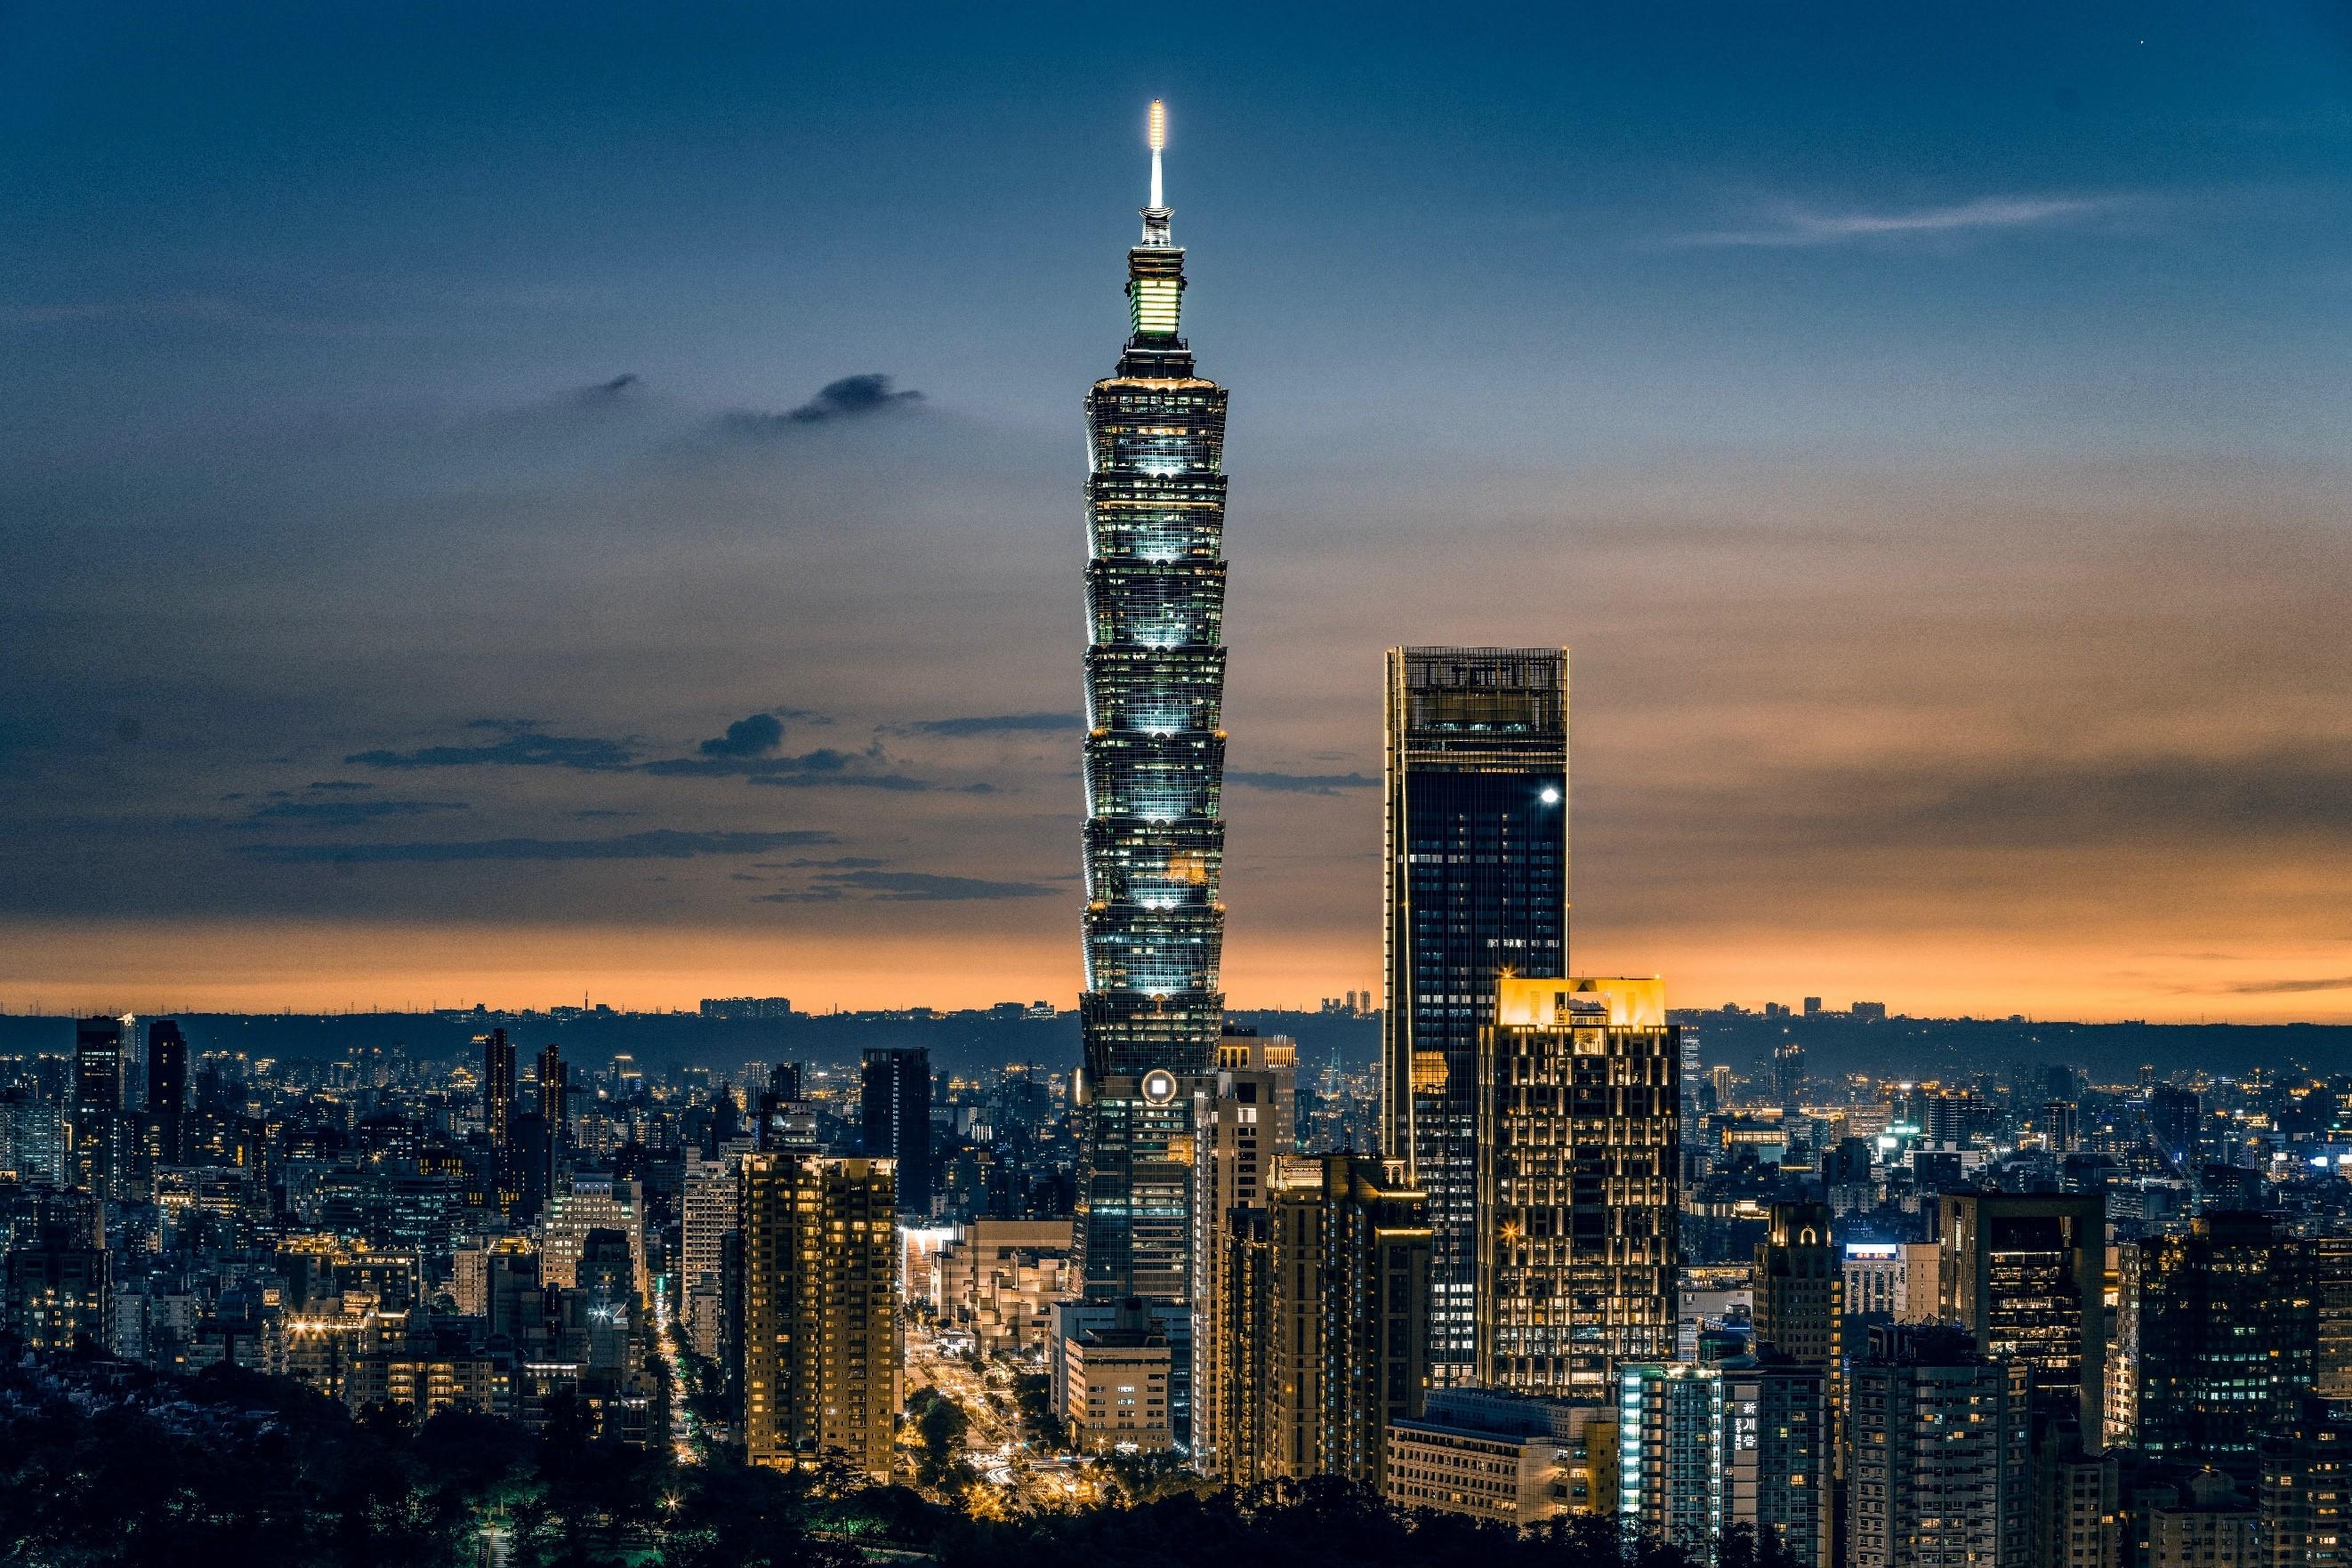 Course Image {mlang en}Tactics in TAIWAN{mlang} {mlang de}Taktiken in TAIWAN {mlang}